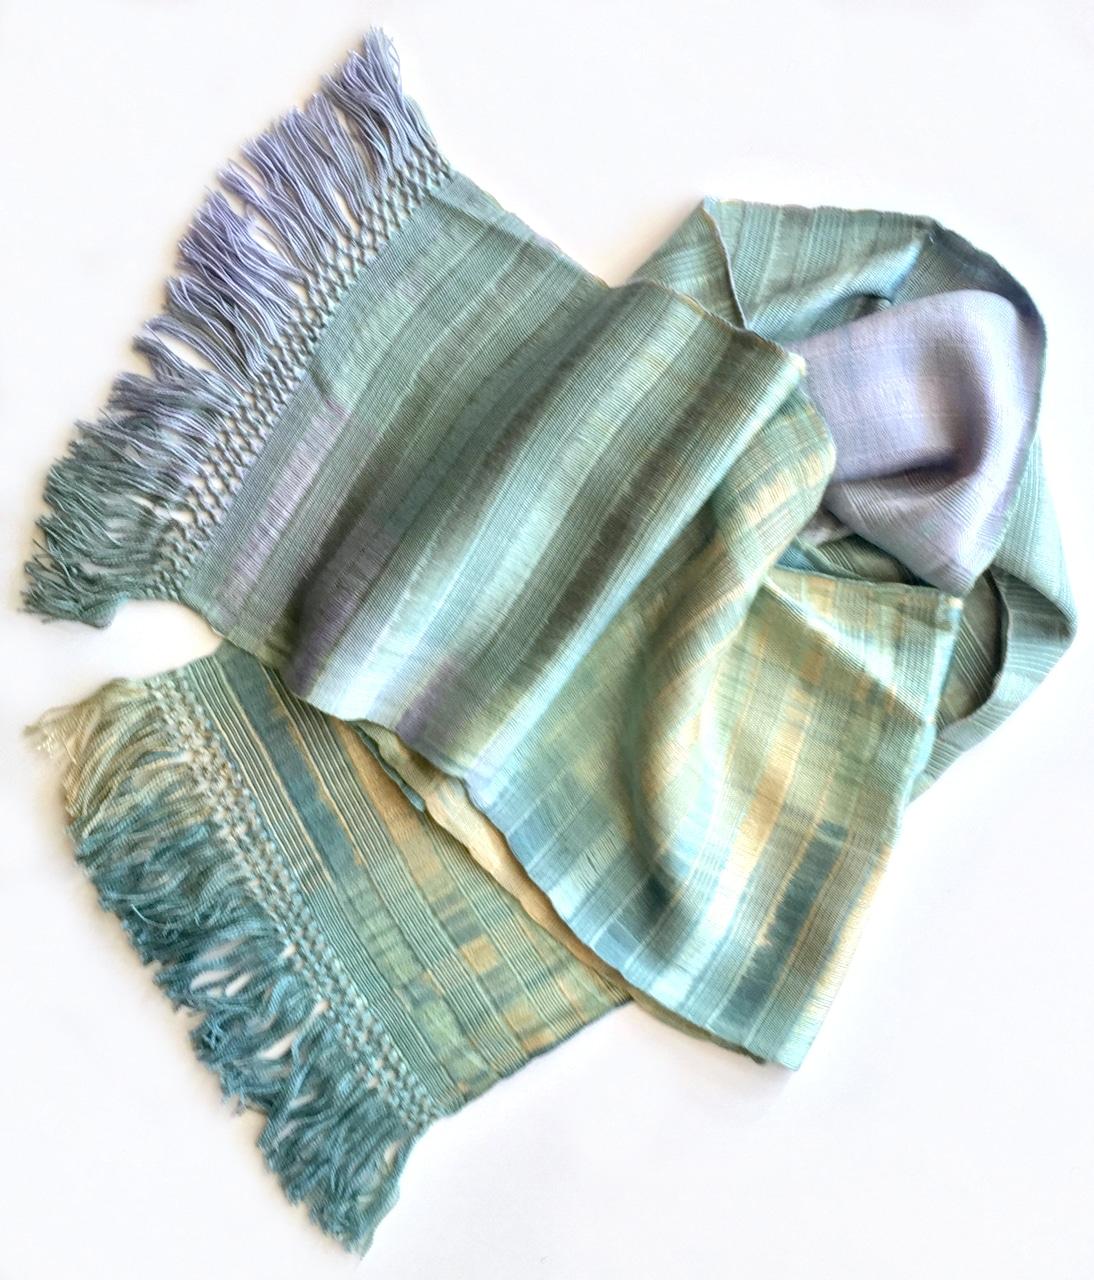 Pale Blue, Lilac, Jade, Beige - Lightweight Bamboo Open-Weave Handwoven Scarf 8 x 68